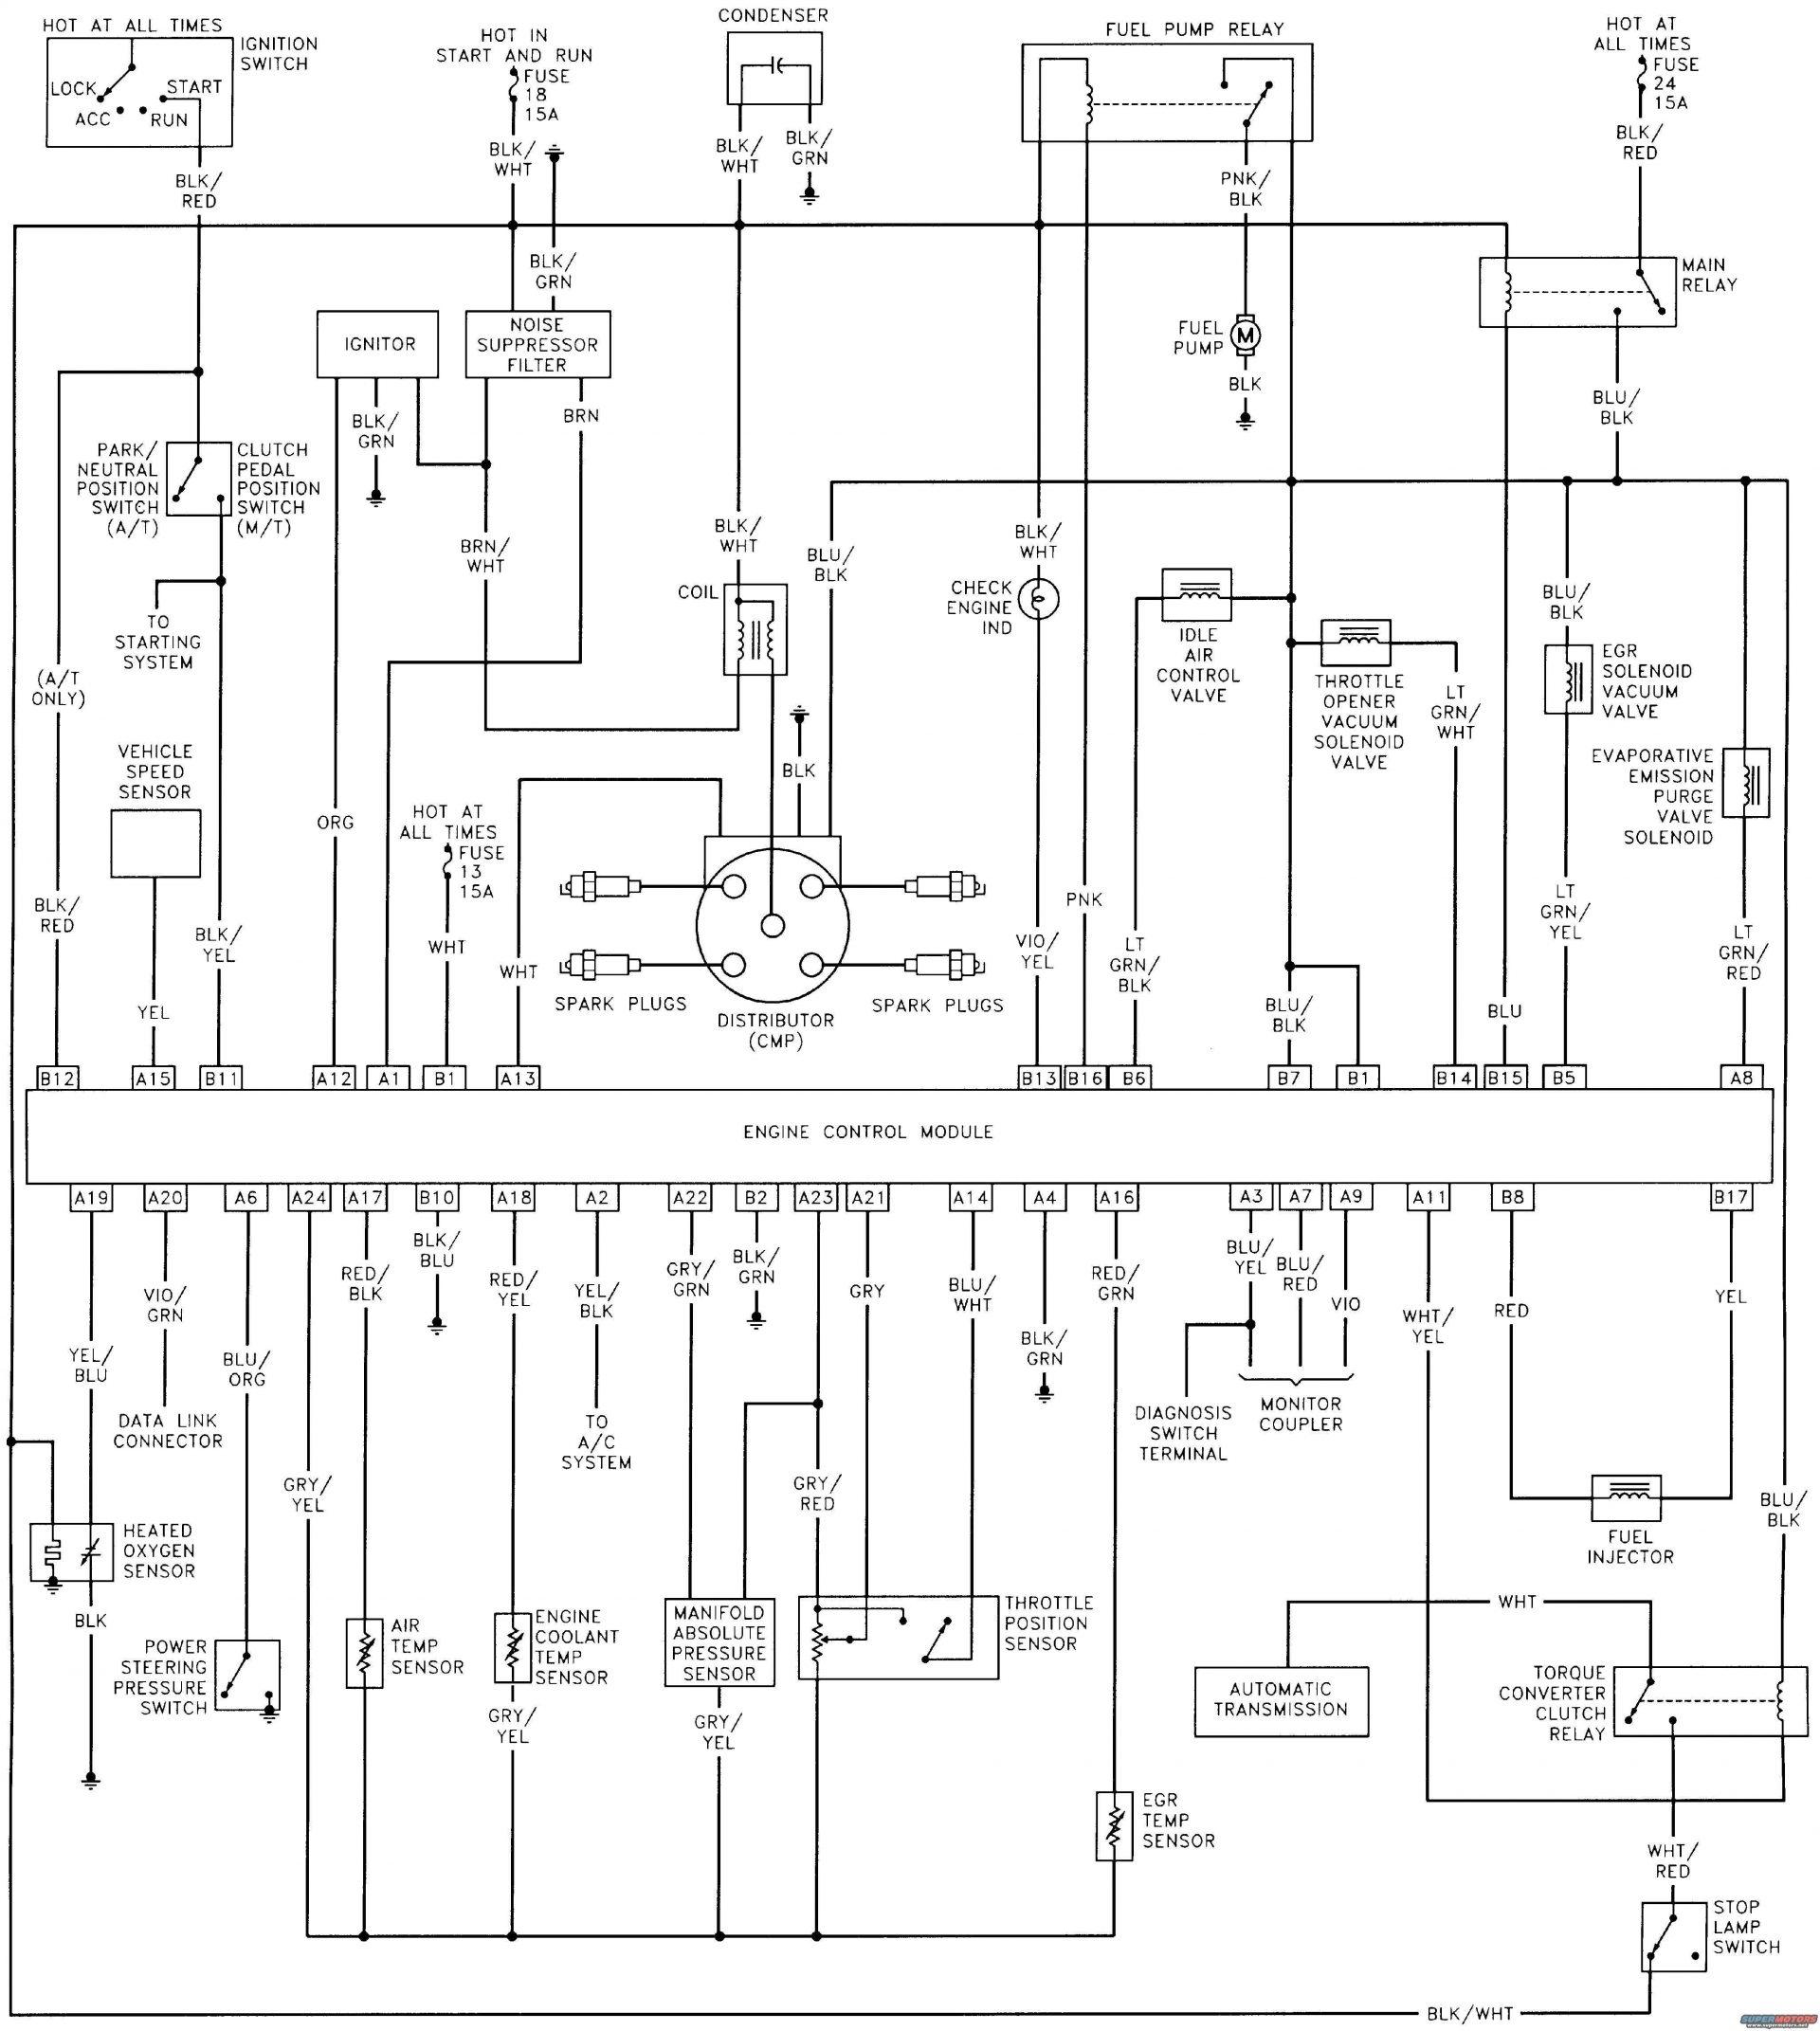 wiring diagram c five ys80 clark window ac wiring diagram avalon wiring diagram clark 530 wiring diagram #2